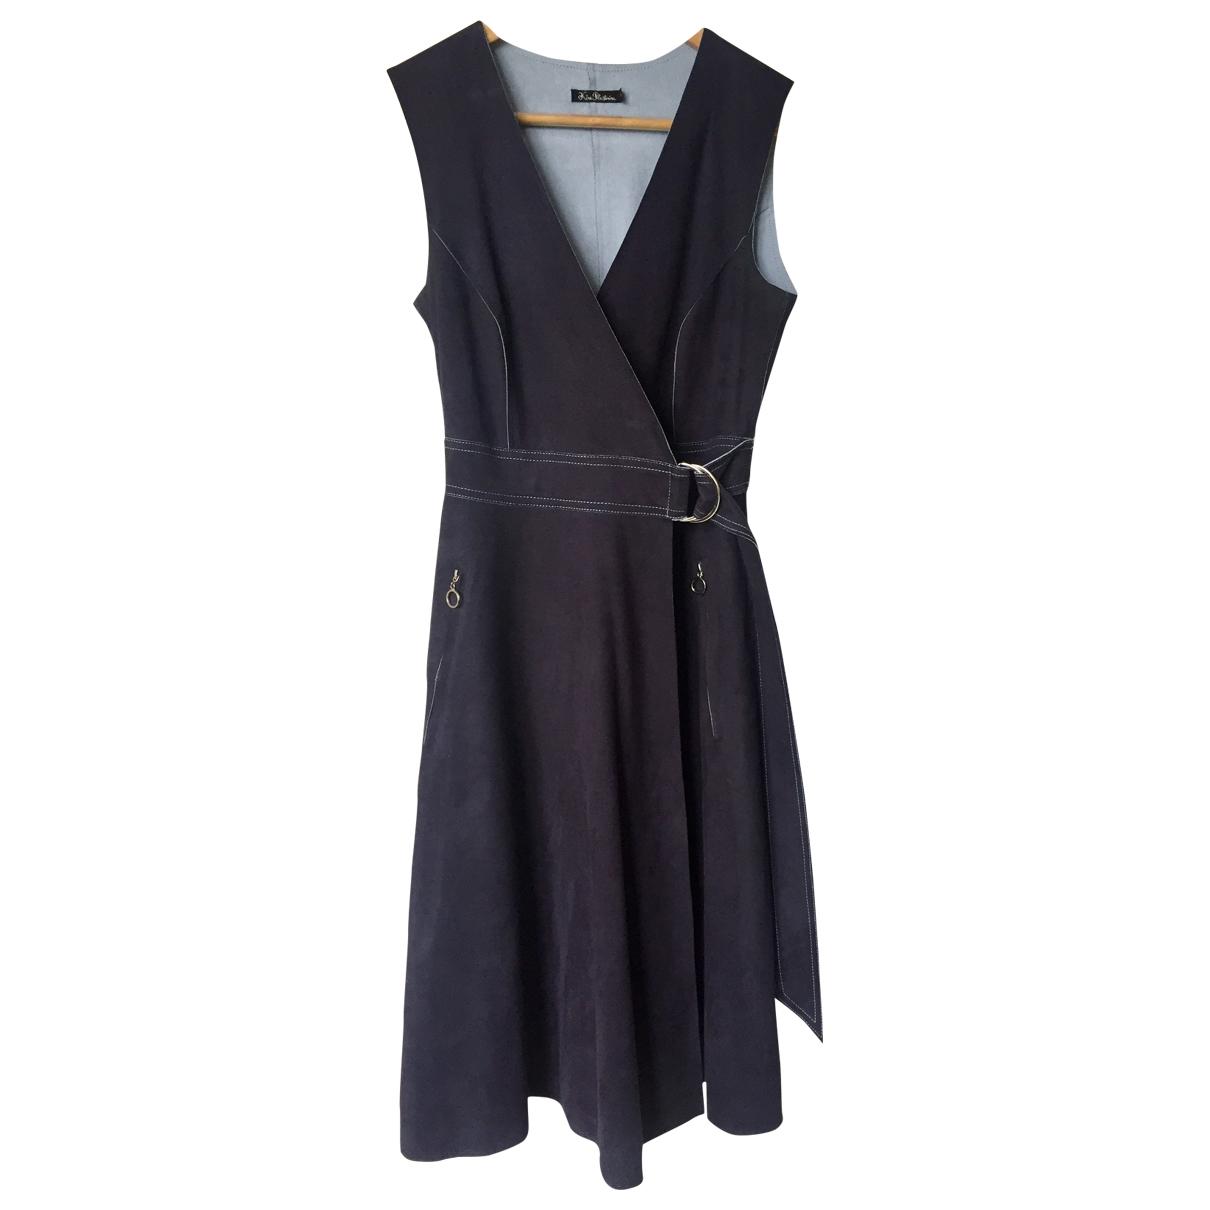 Lublu Kira Plastinina \N Kleid in  Anthrazit Polyester